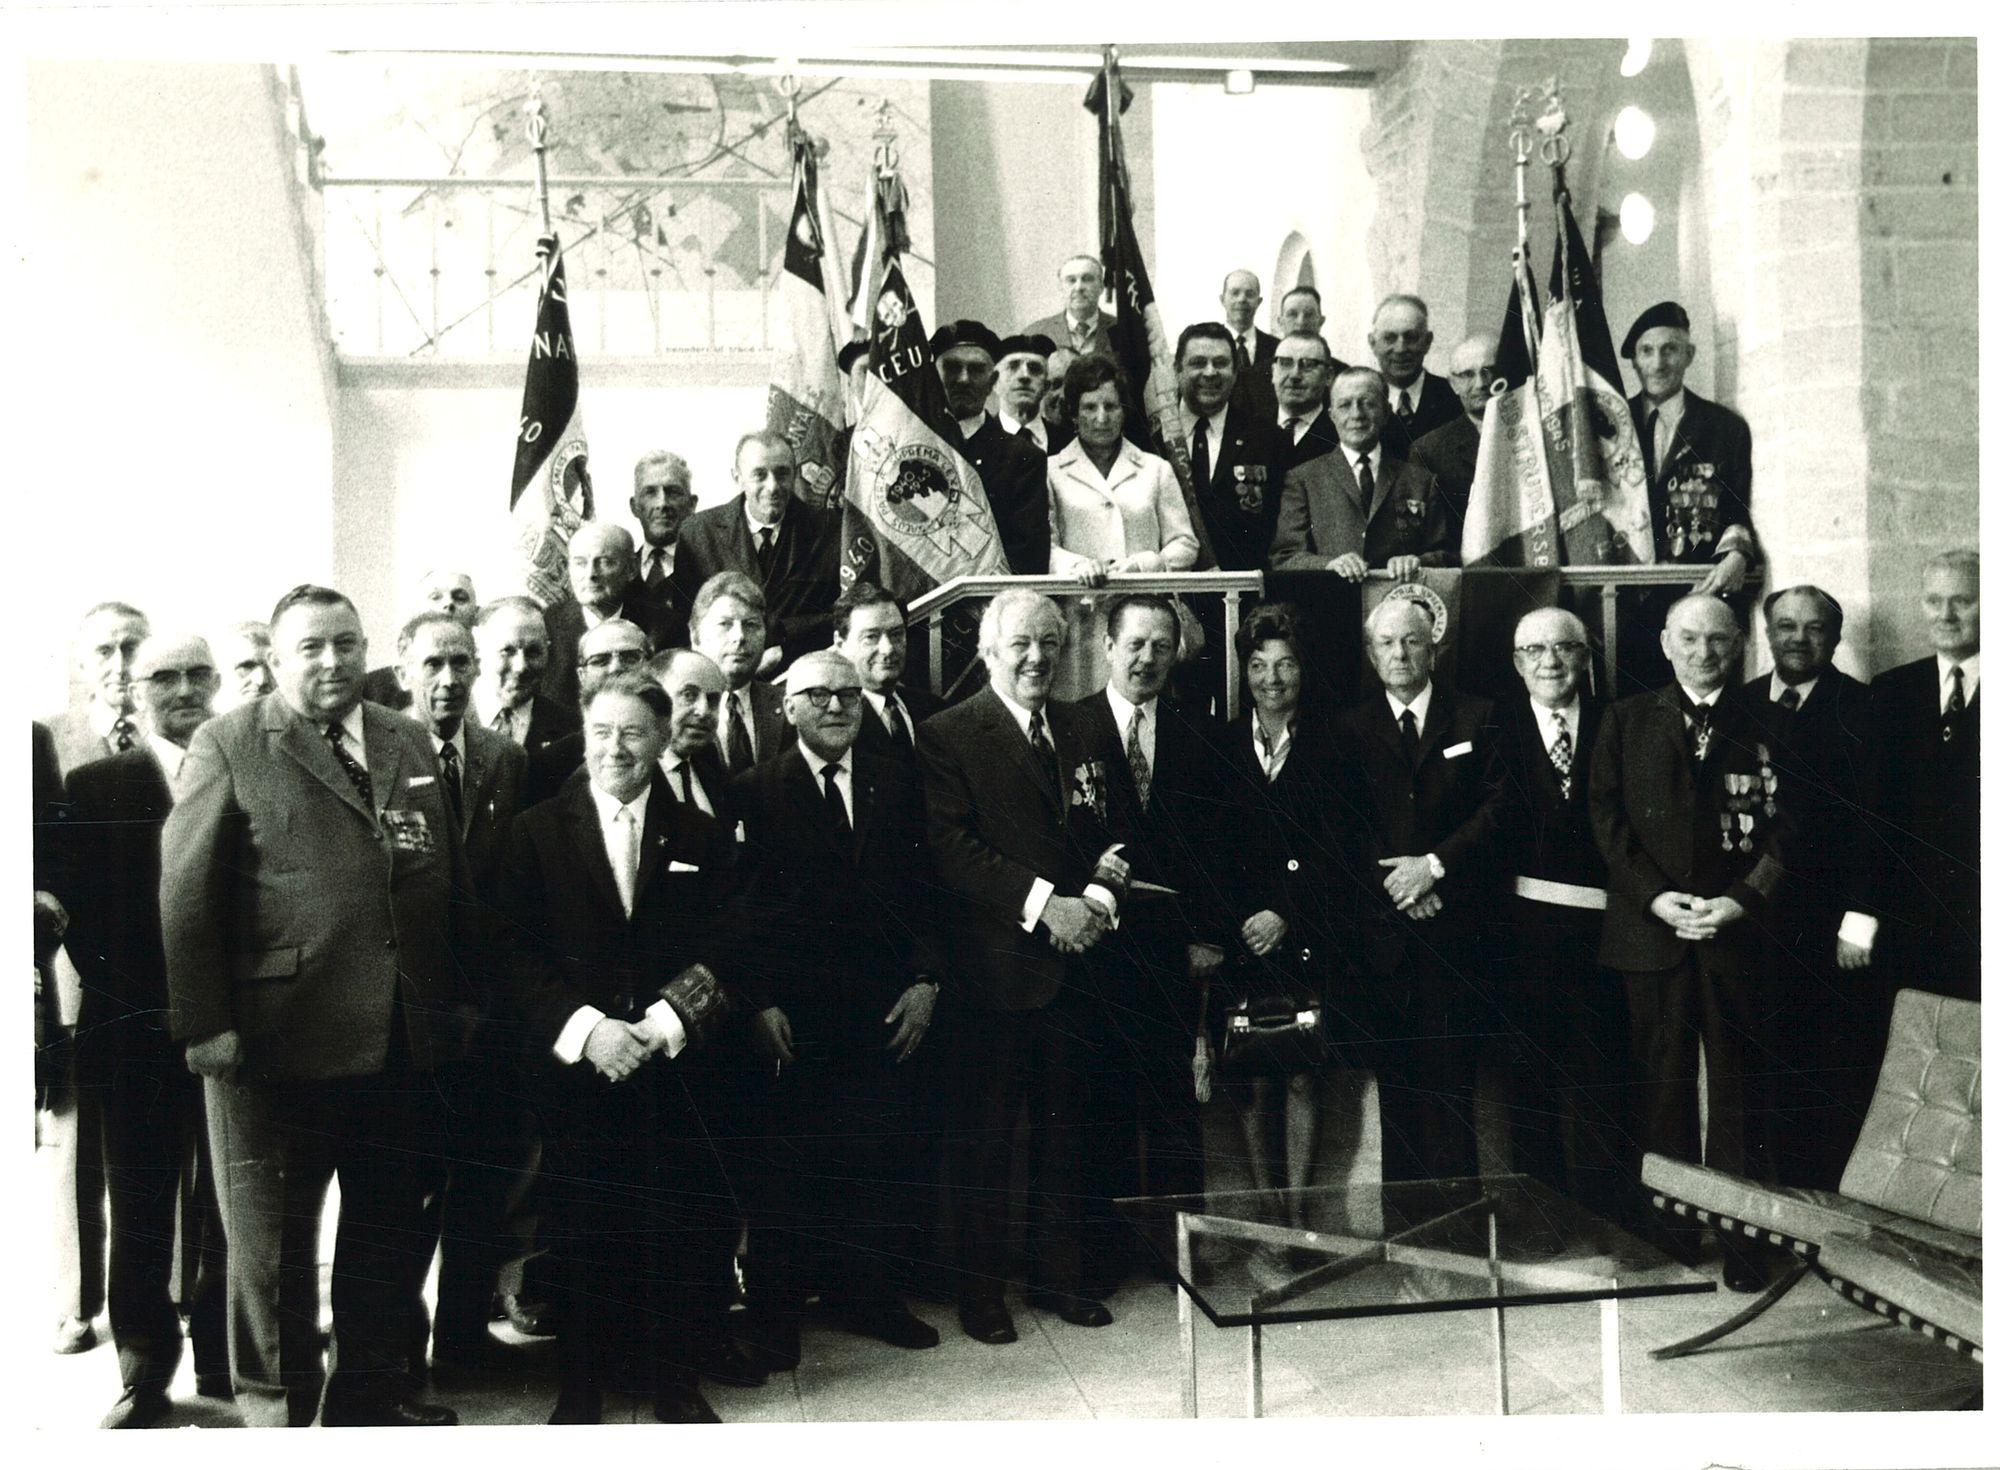 Oudstrijdersbond 1940-1945